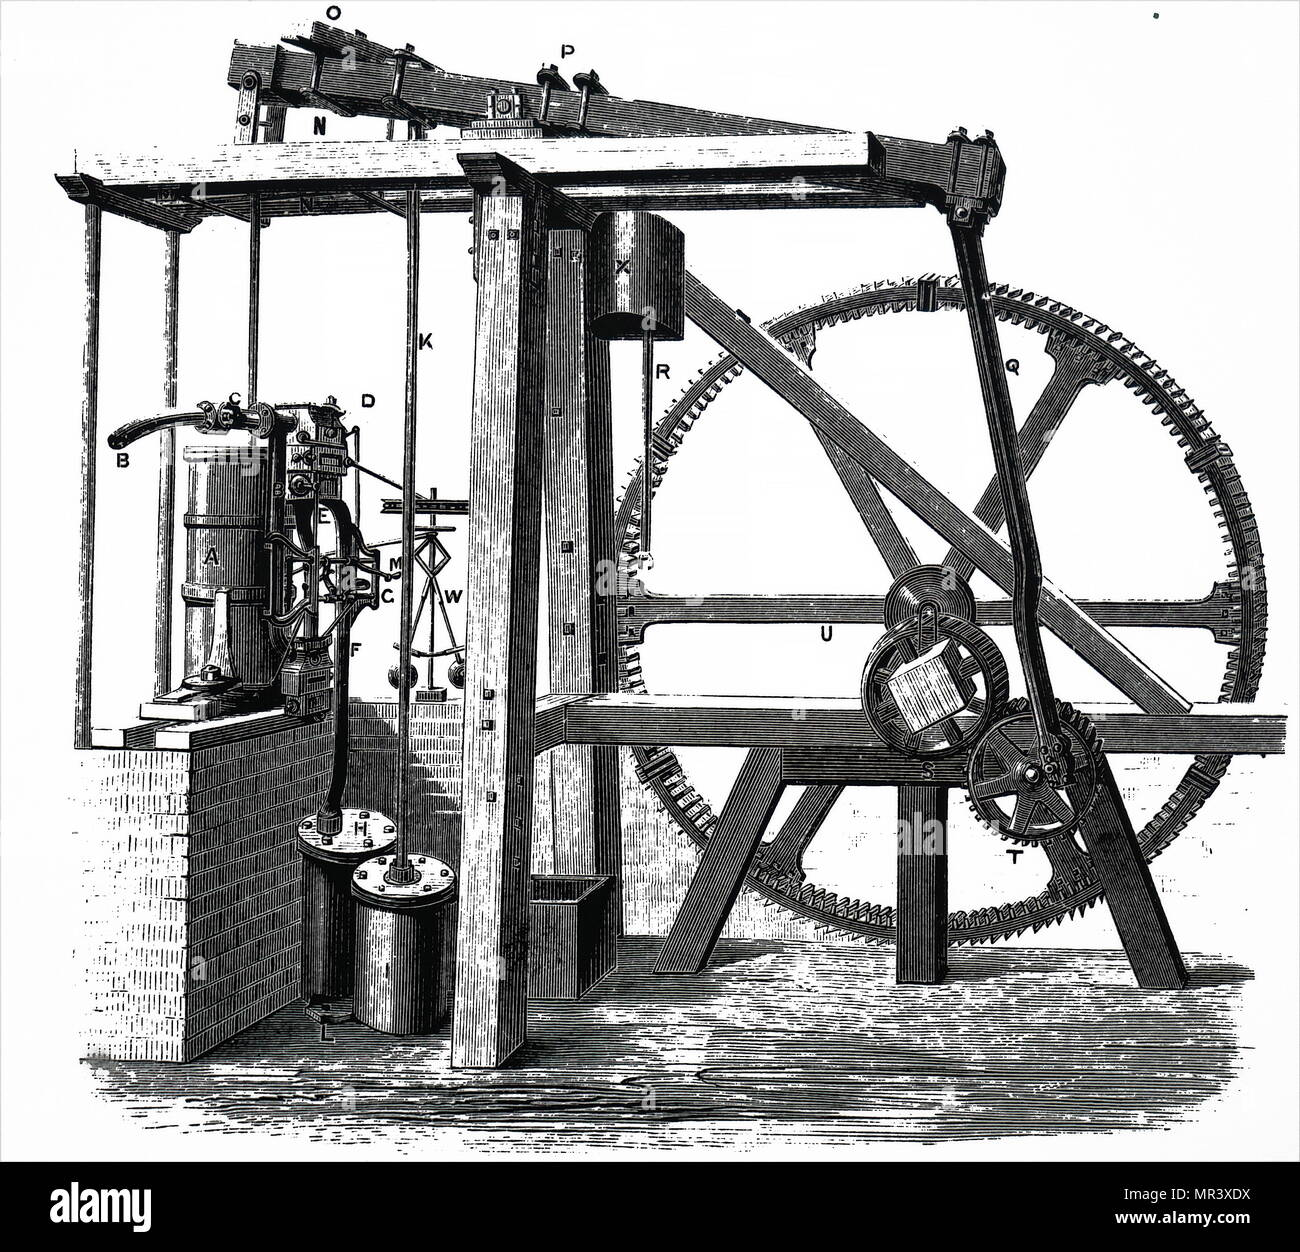 james watt steam engine diagram of plant parts worksheet engraving depicting the condenser 39s